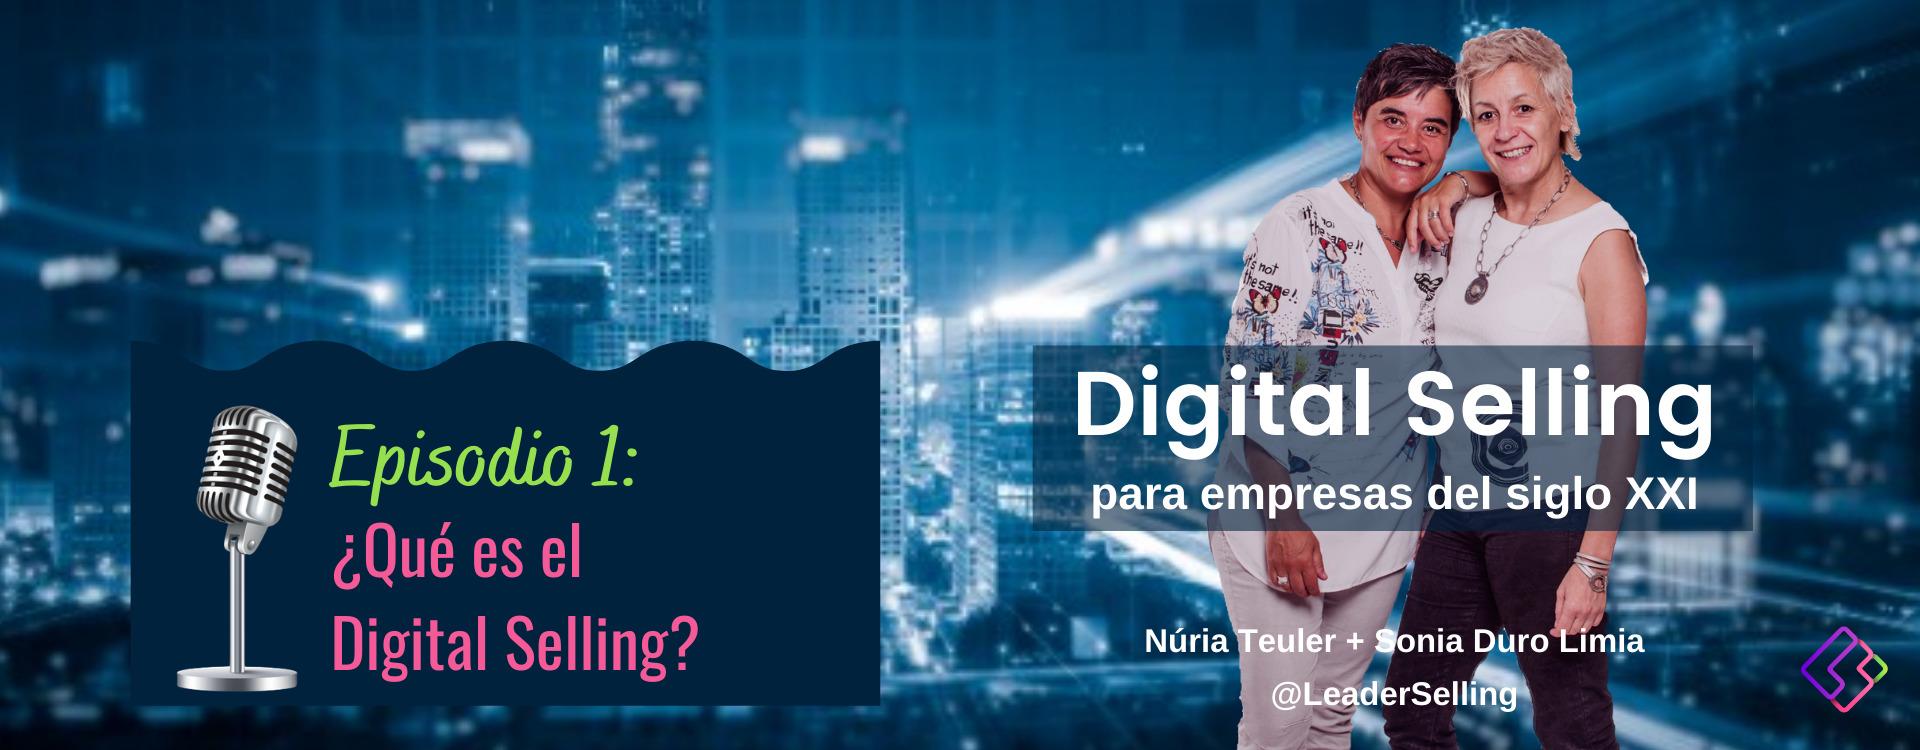 Podcast de Leader Selling, digital selling para empresas del siglo xxi